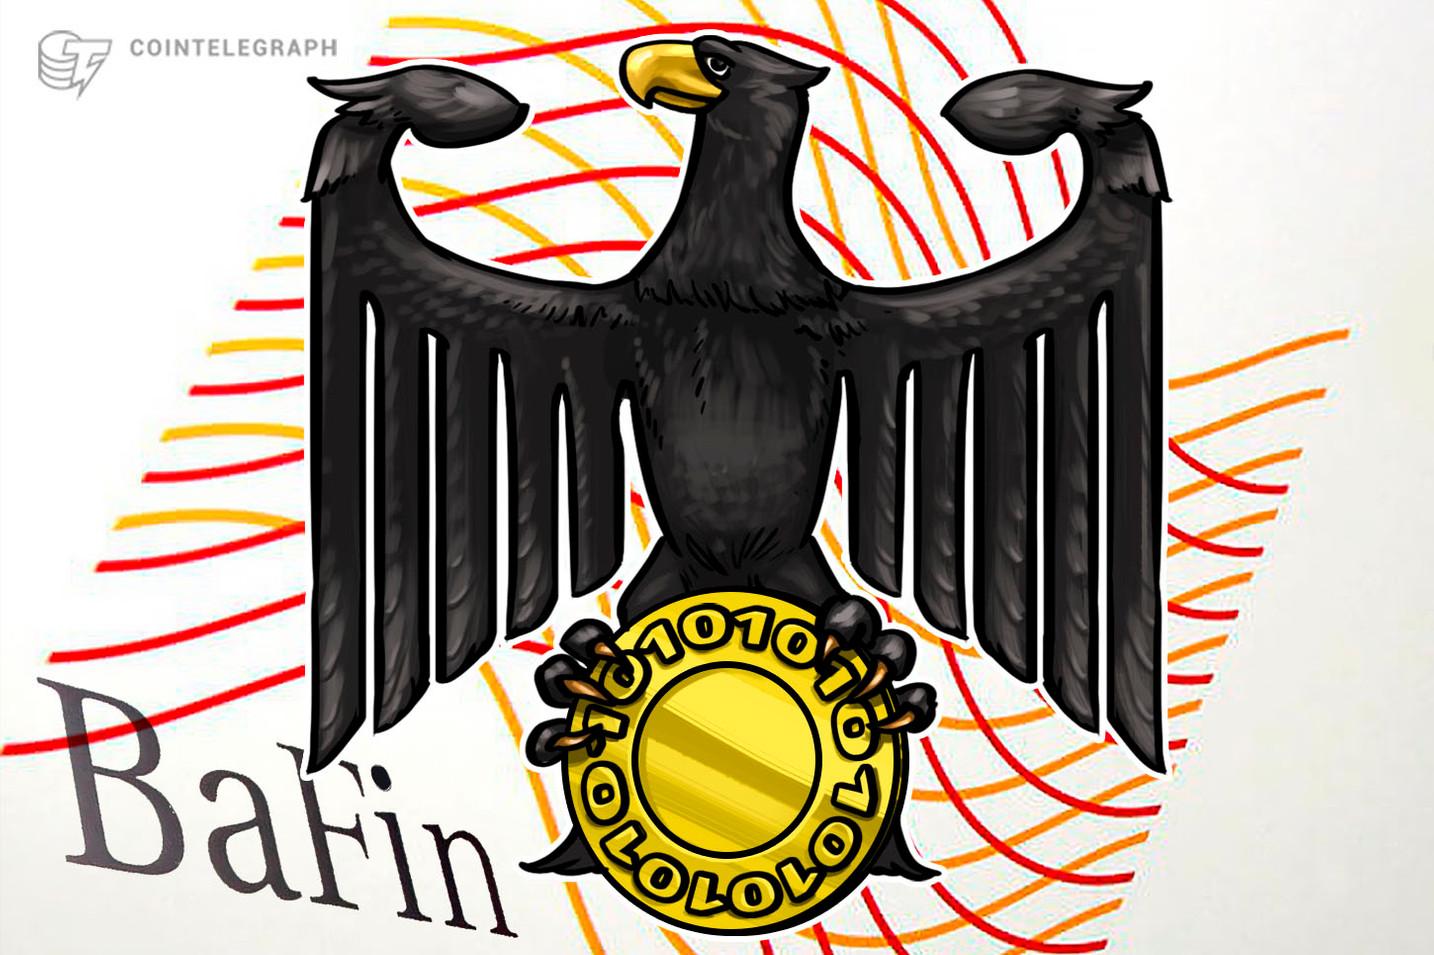 BaFin beendet Geschäft von nicht zugelassenem Bitcoin-CfD-Anbieter CFDPremium